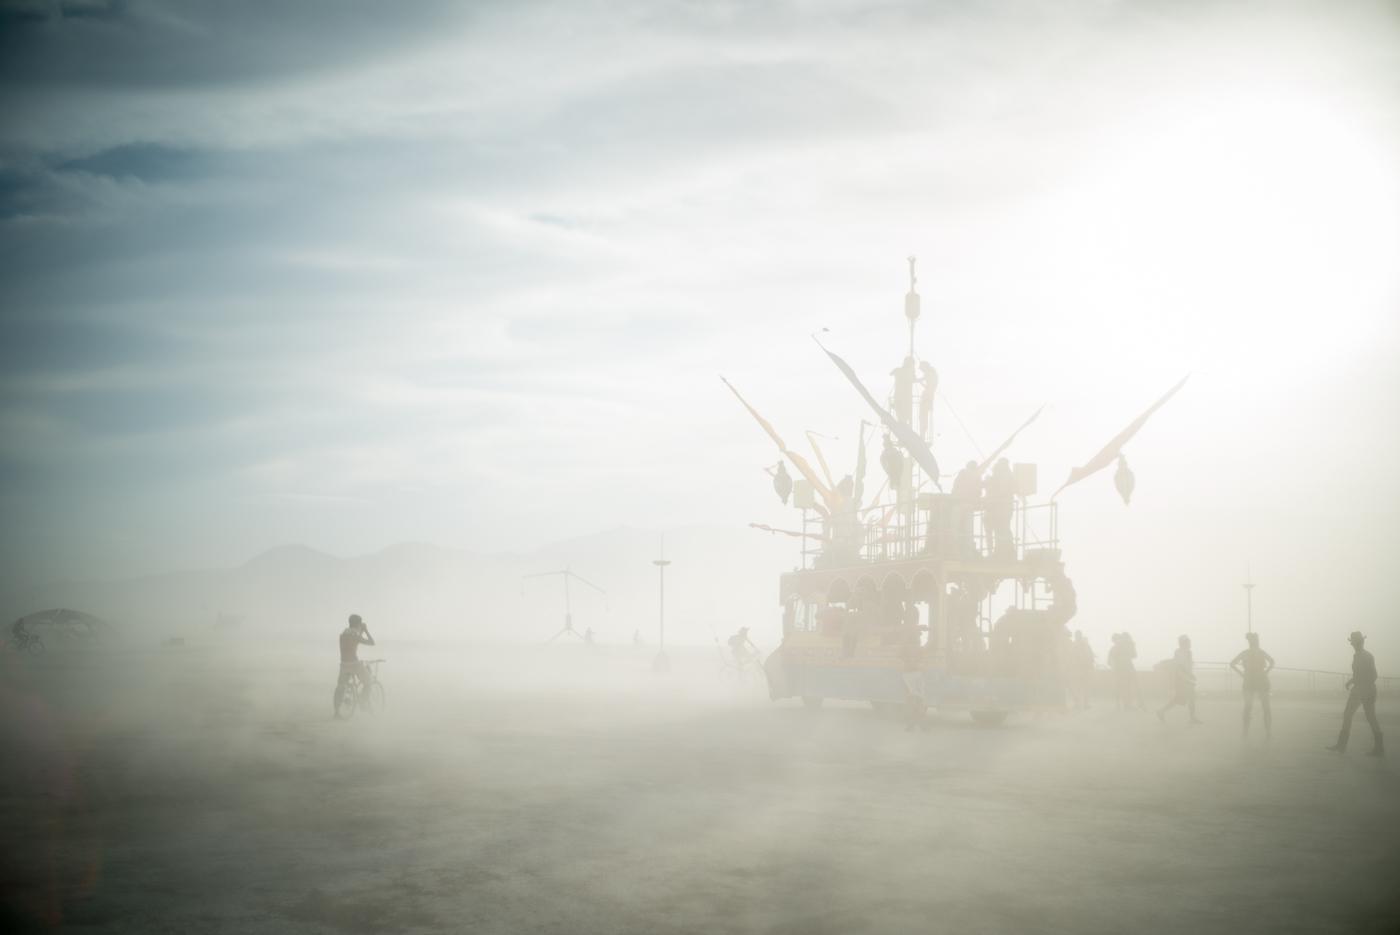 Dusty Vessel, Burning Man 2014: In Dust We Trust - Photos of a Dusty Playa